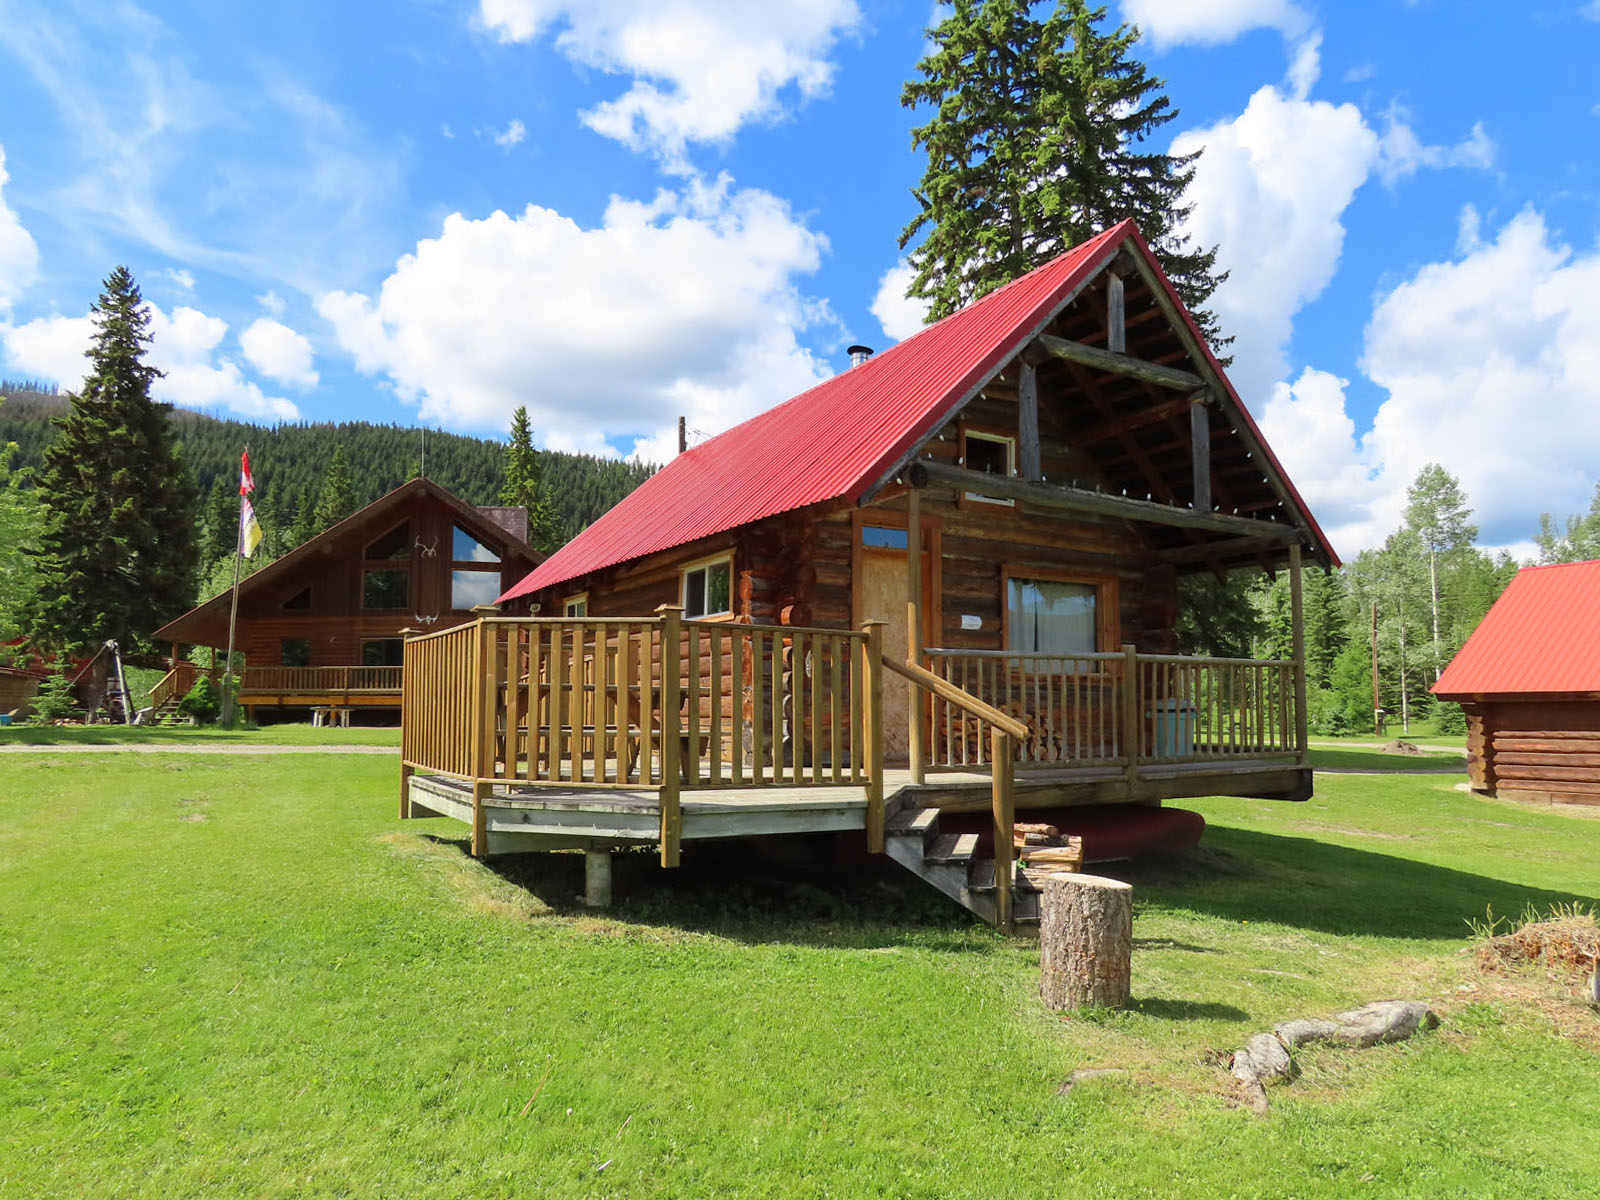 Canim lake resort 40